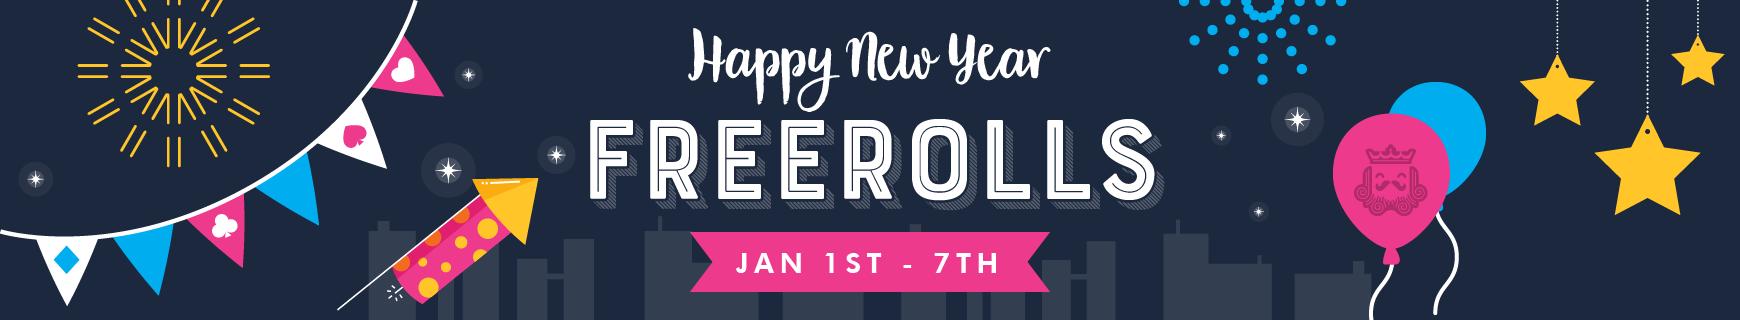 happy new year freerolls